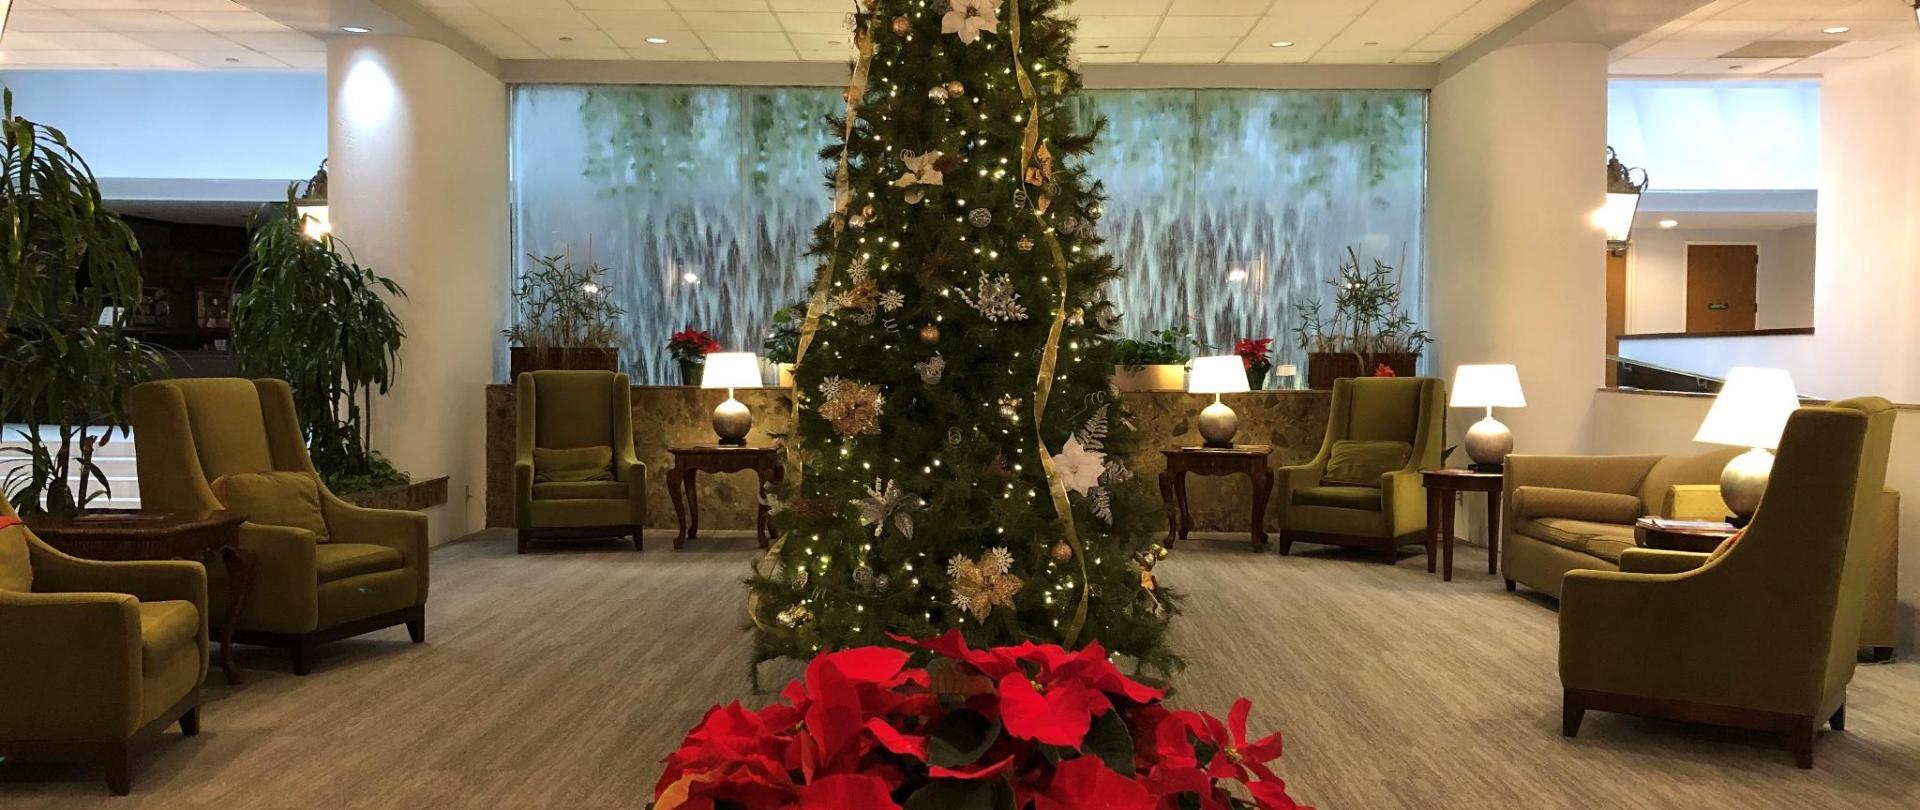 Lobby Christmas.jpg